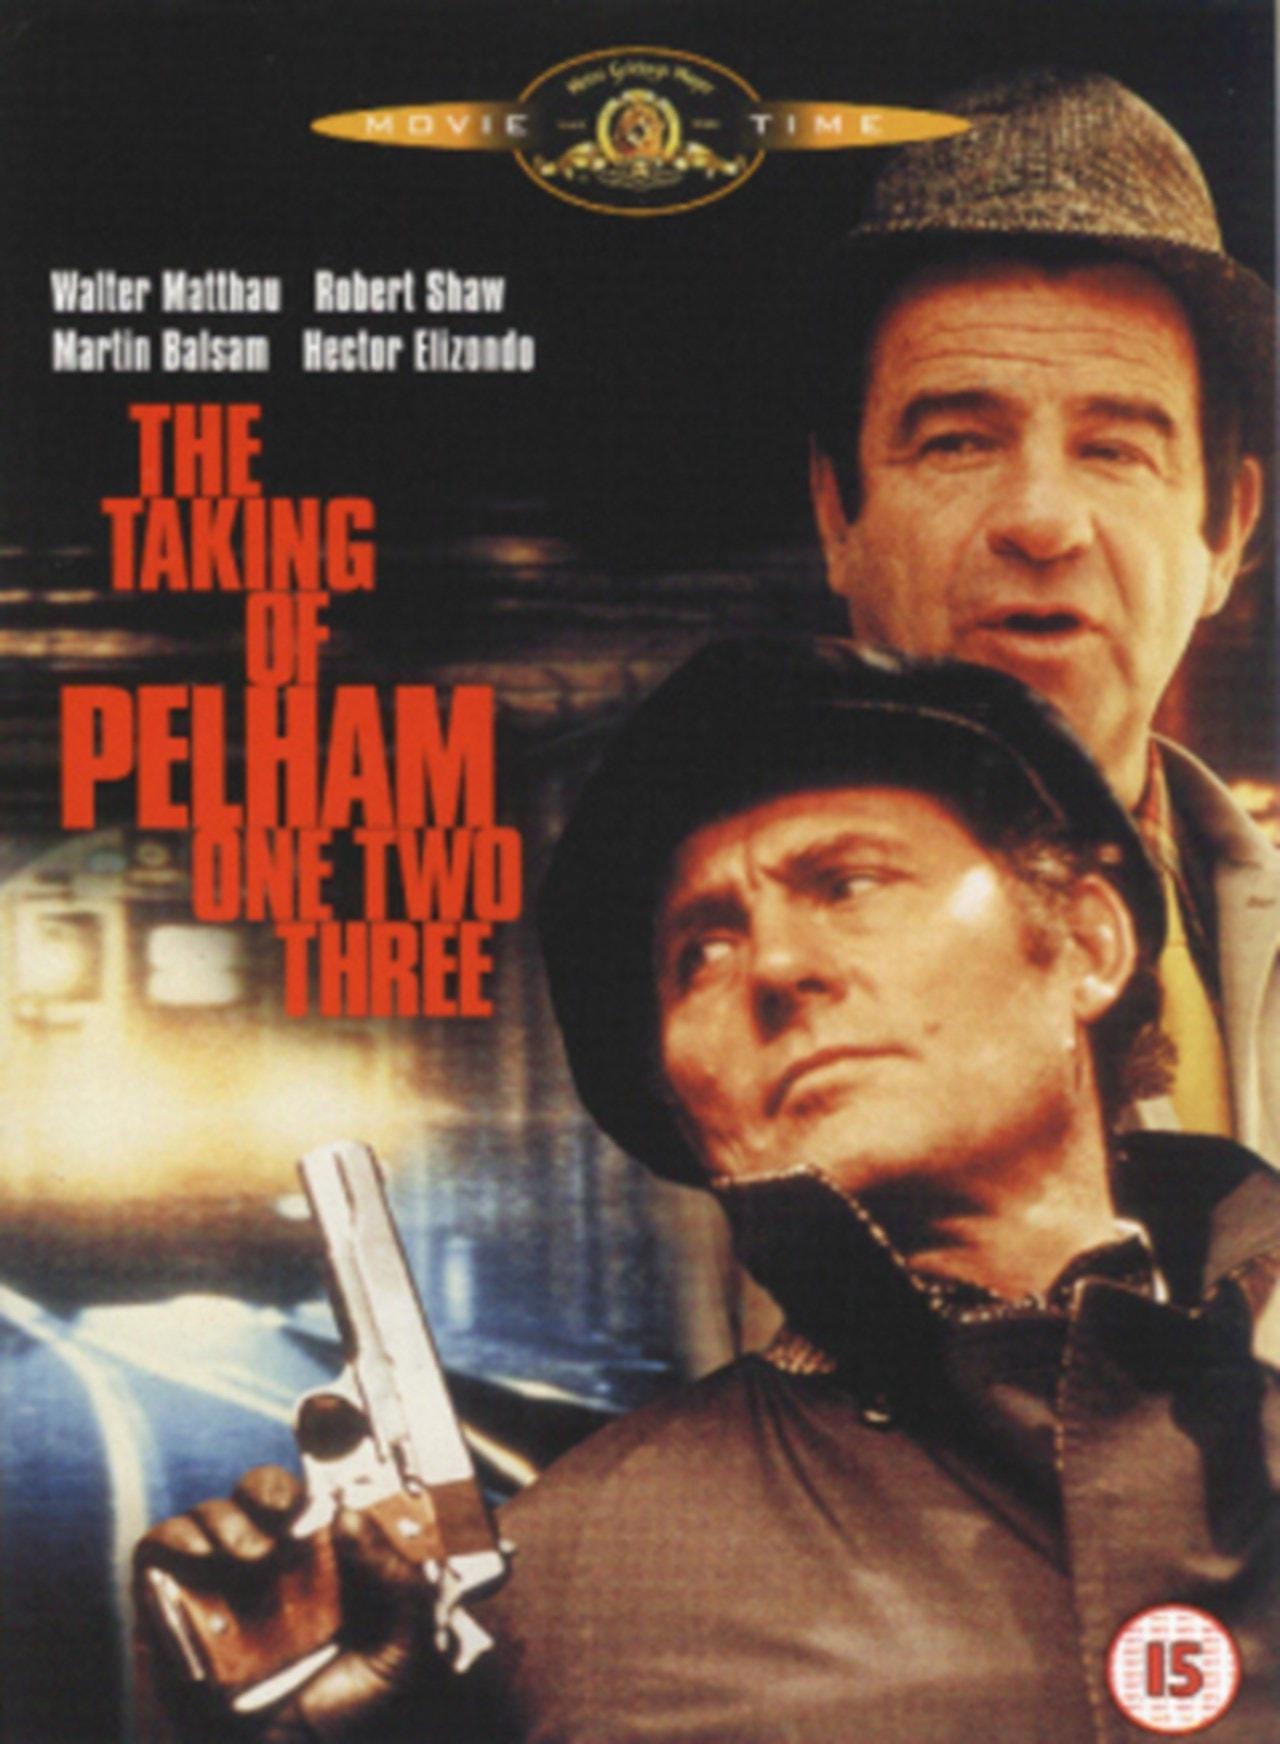 The Taking of Pelham One Two Three - 1